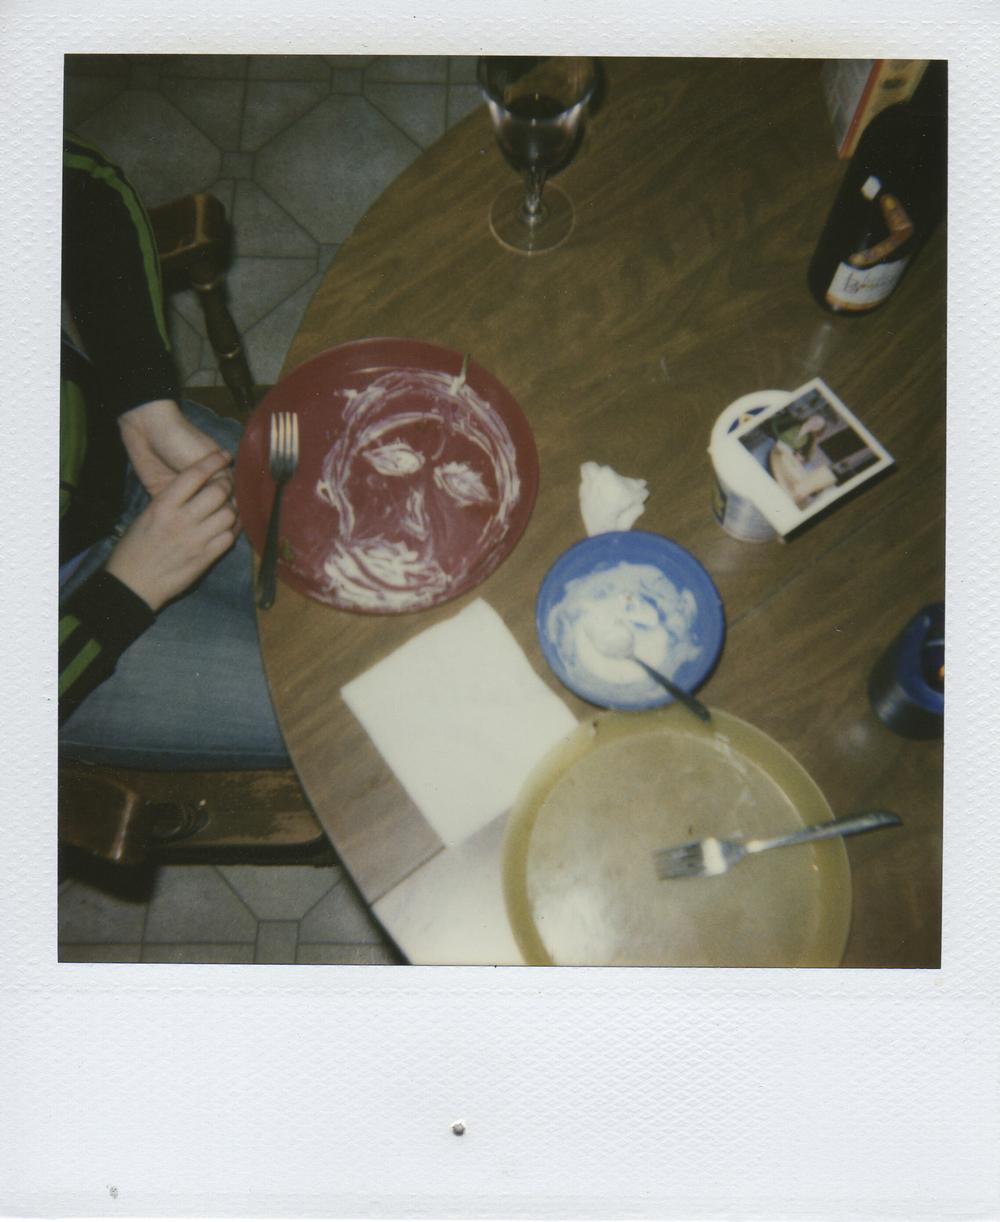 jlaurence-polaroid-029.jpg